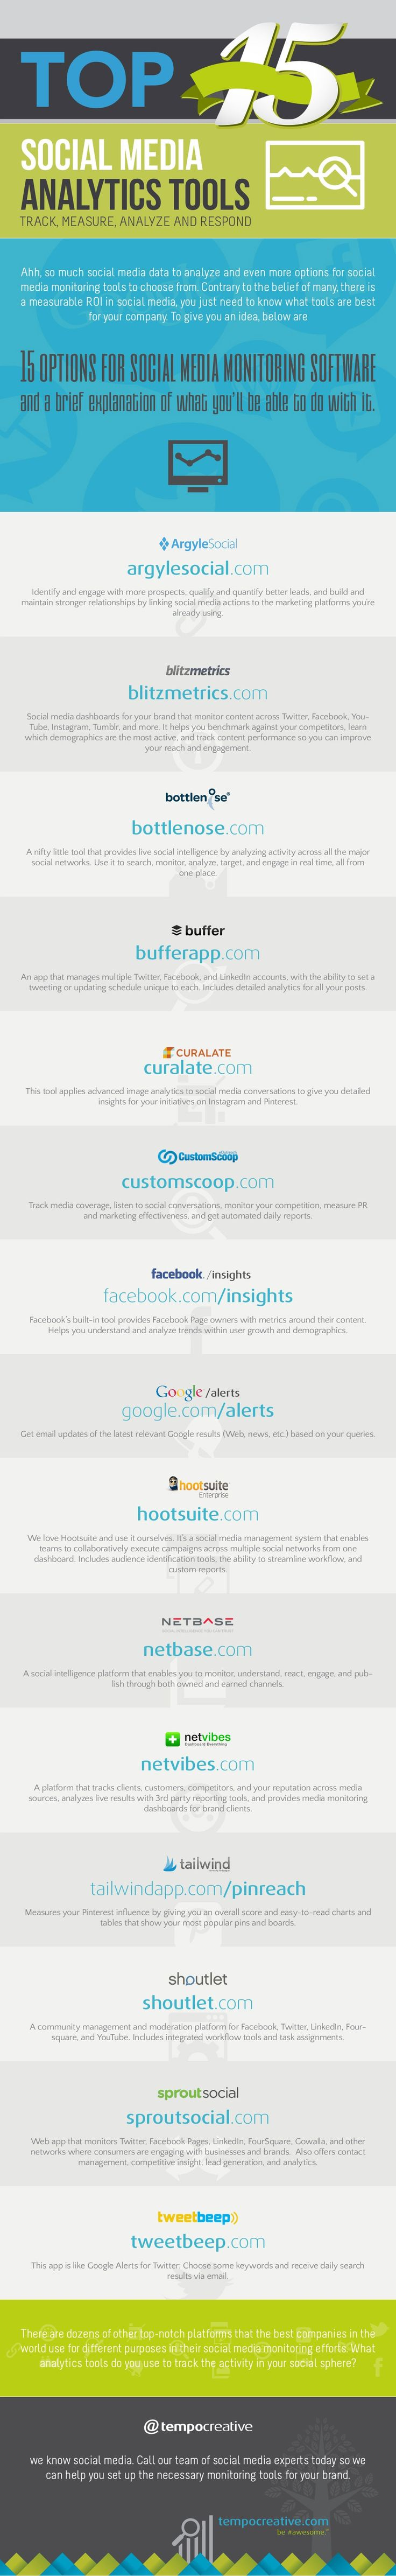 http://social-media-strategy-template.blogspot.com [INFOGRAPHIC] Top 15 Social Media Analytics Tools—Track, Measure, Analyze, Respond: ArgyleSocial; Blitzmetrics; Bottlenose; Buffer; Curalate; CustomScoop; Facebook Insights; Google Alerts; Hootsuite; Netbase; Netvibes; Tailwind; Shoutlet; SproutSocial; TweetBeep; Details.